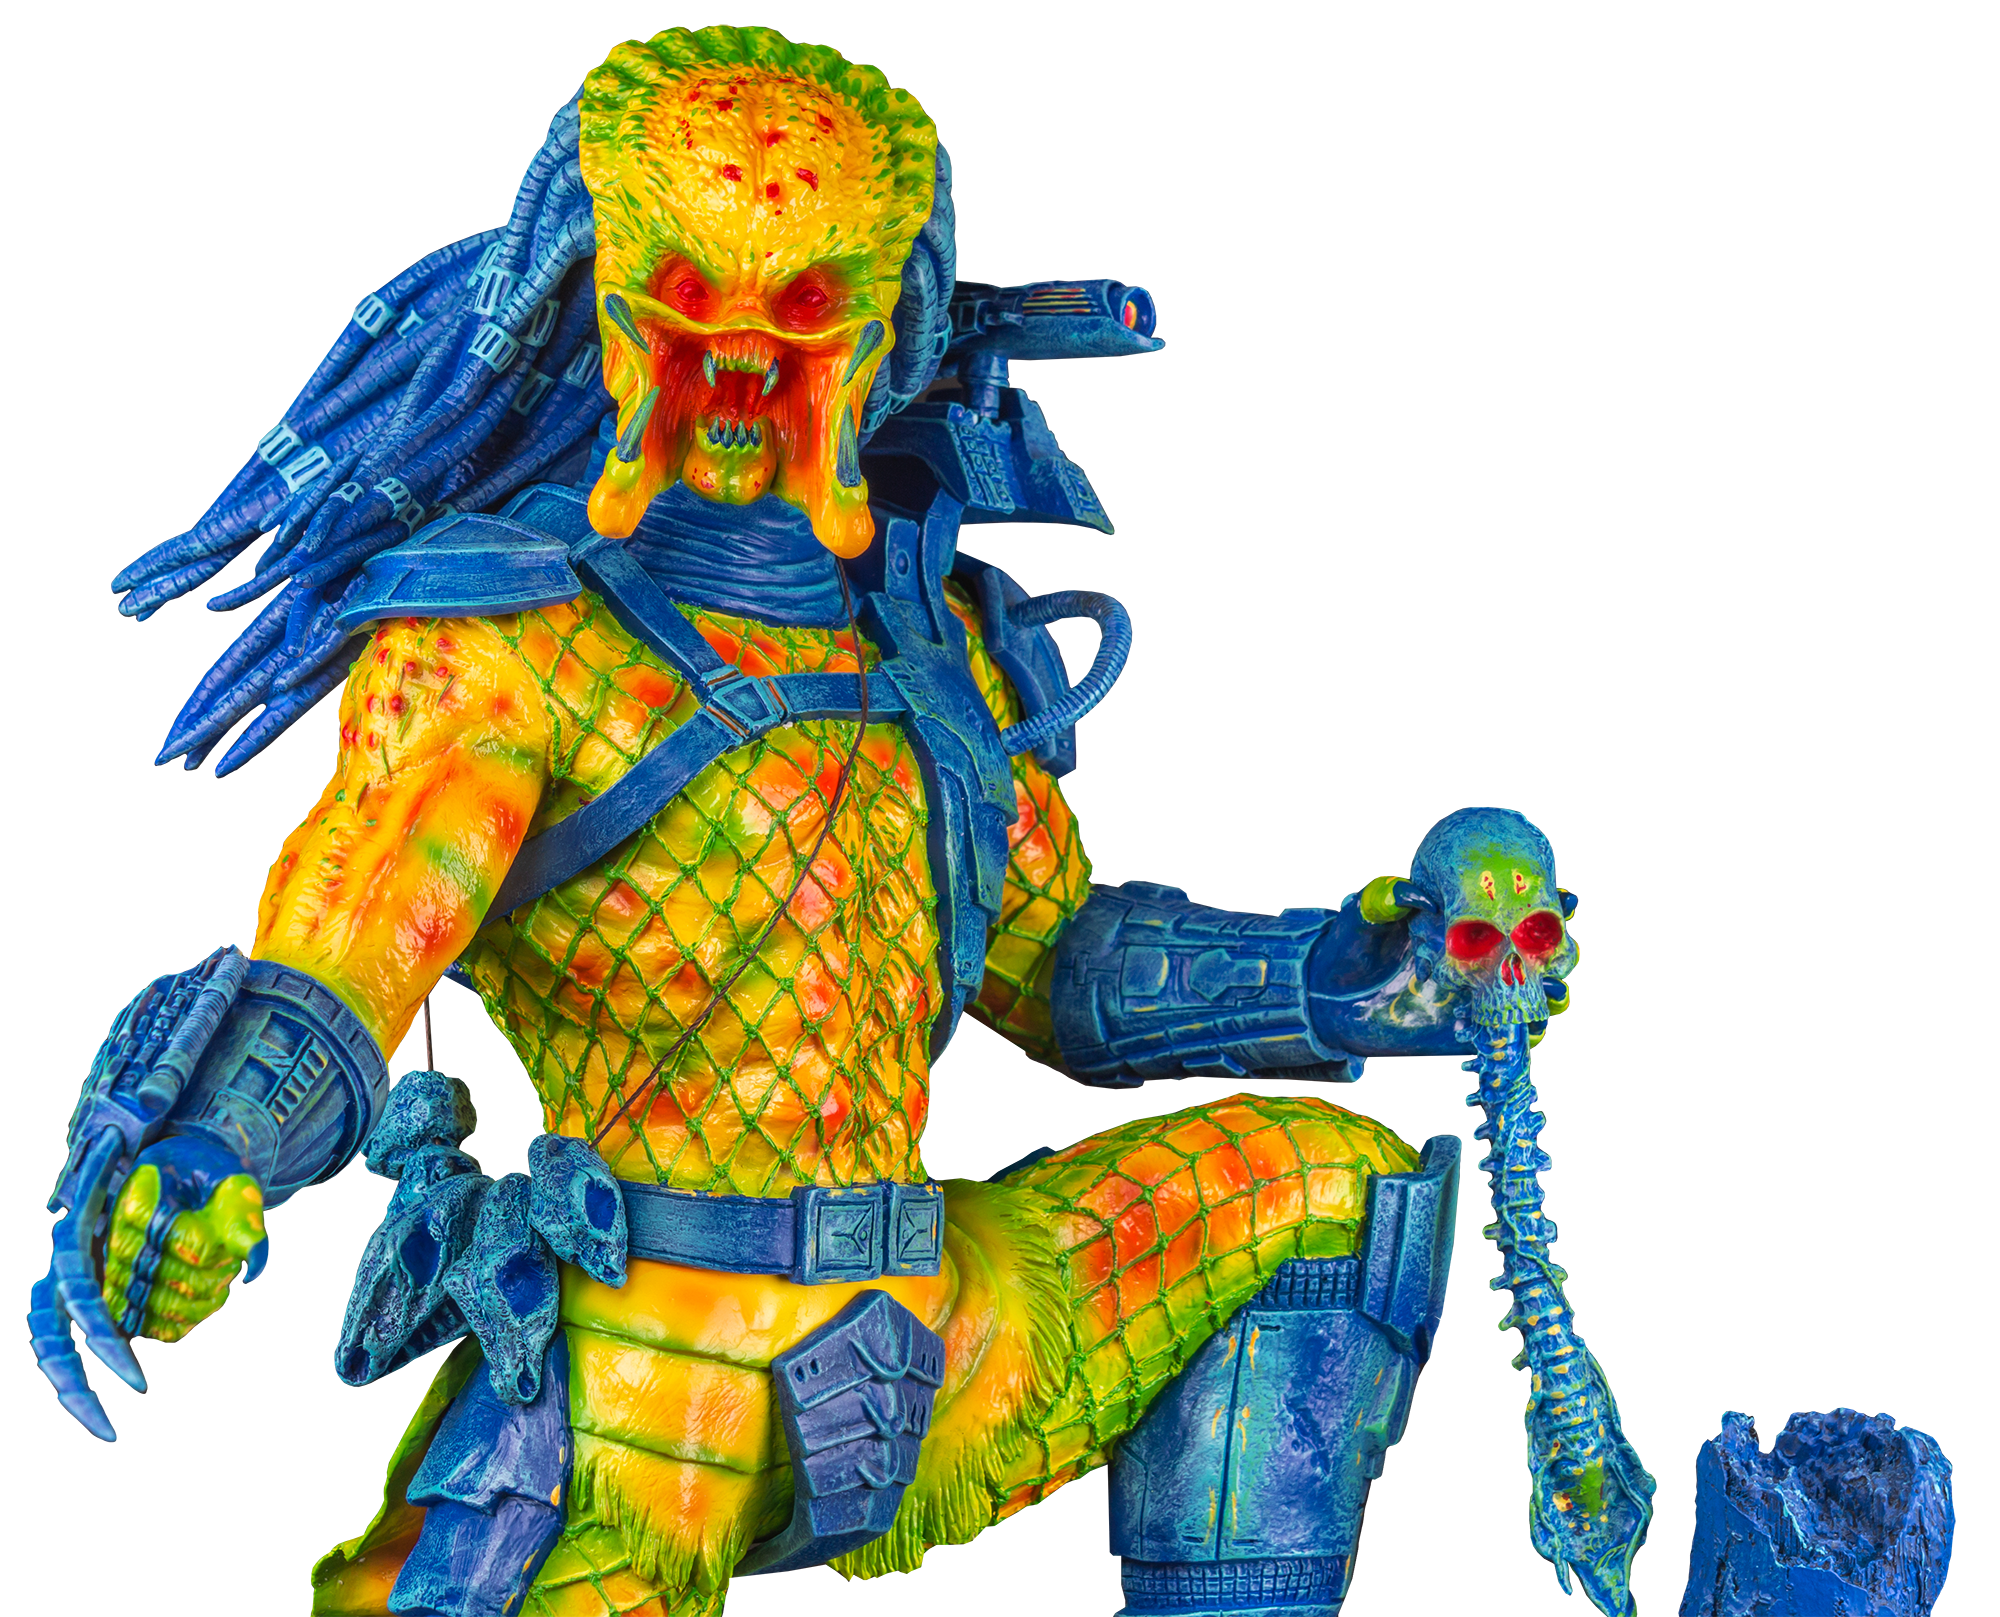 IKO1571-Thermal-Vision-Predator-Statue-POPCULTCHA-EXCLUSIVE-8.png